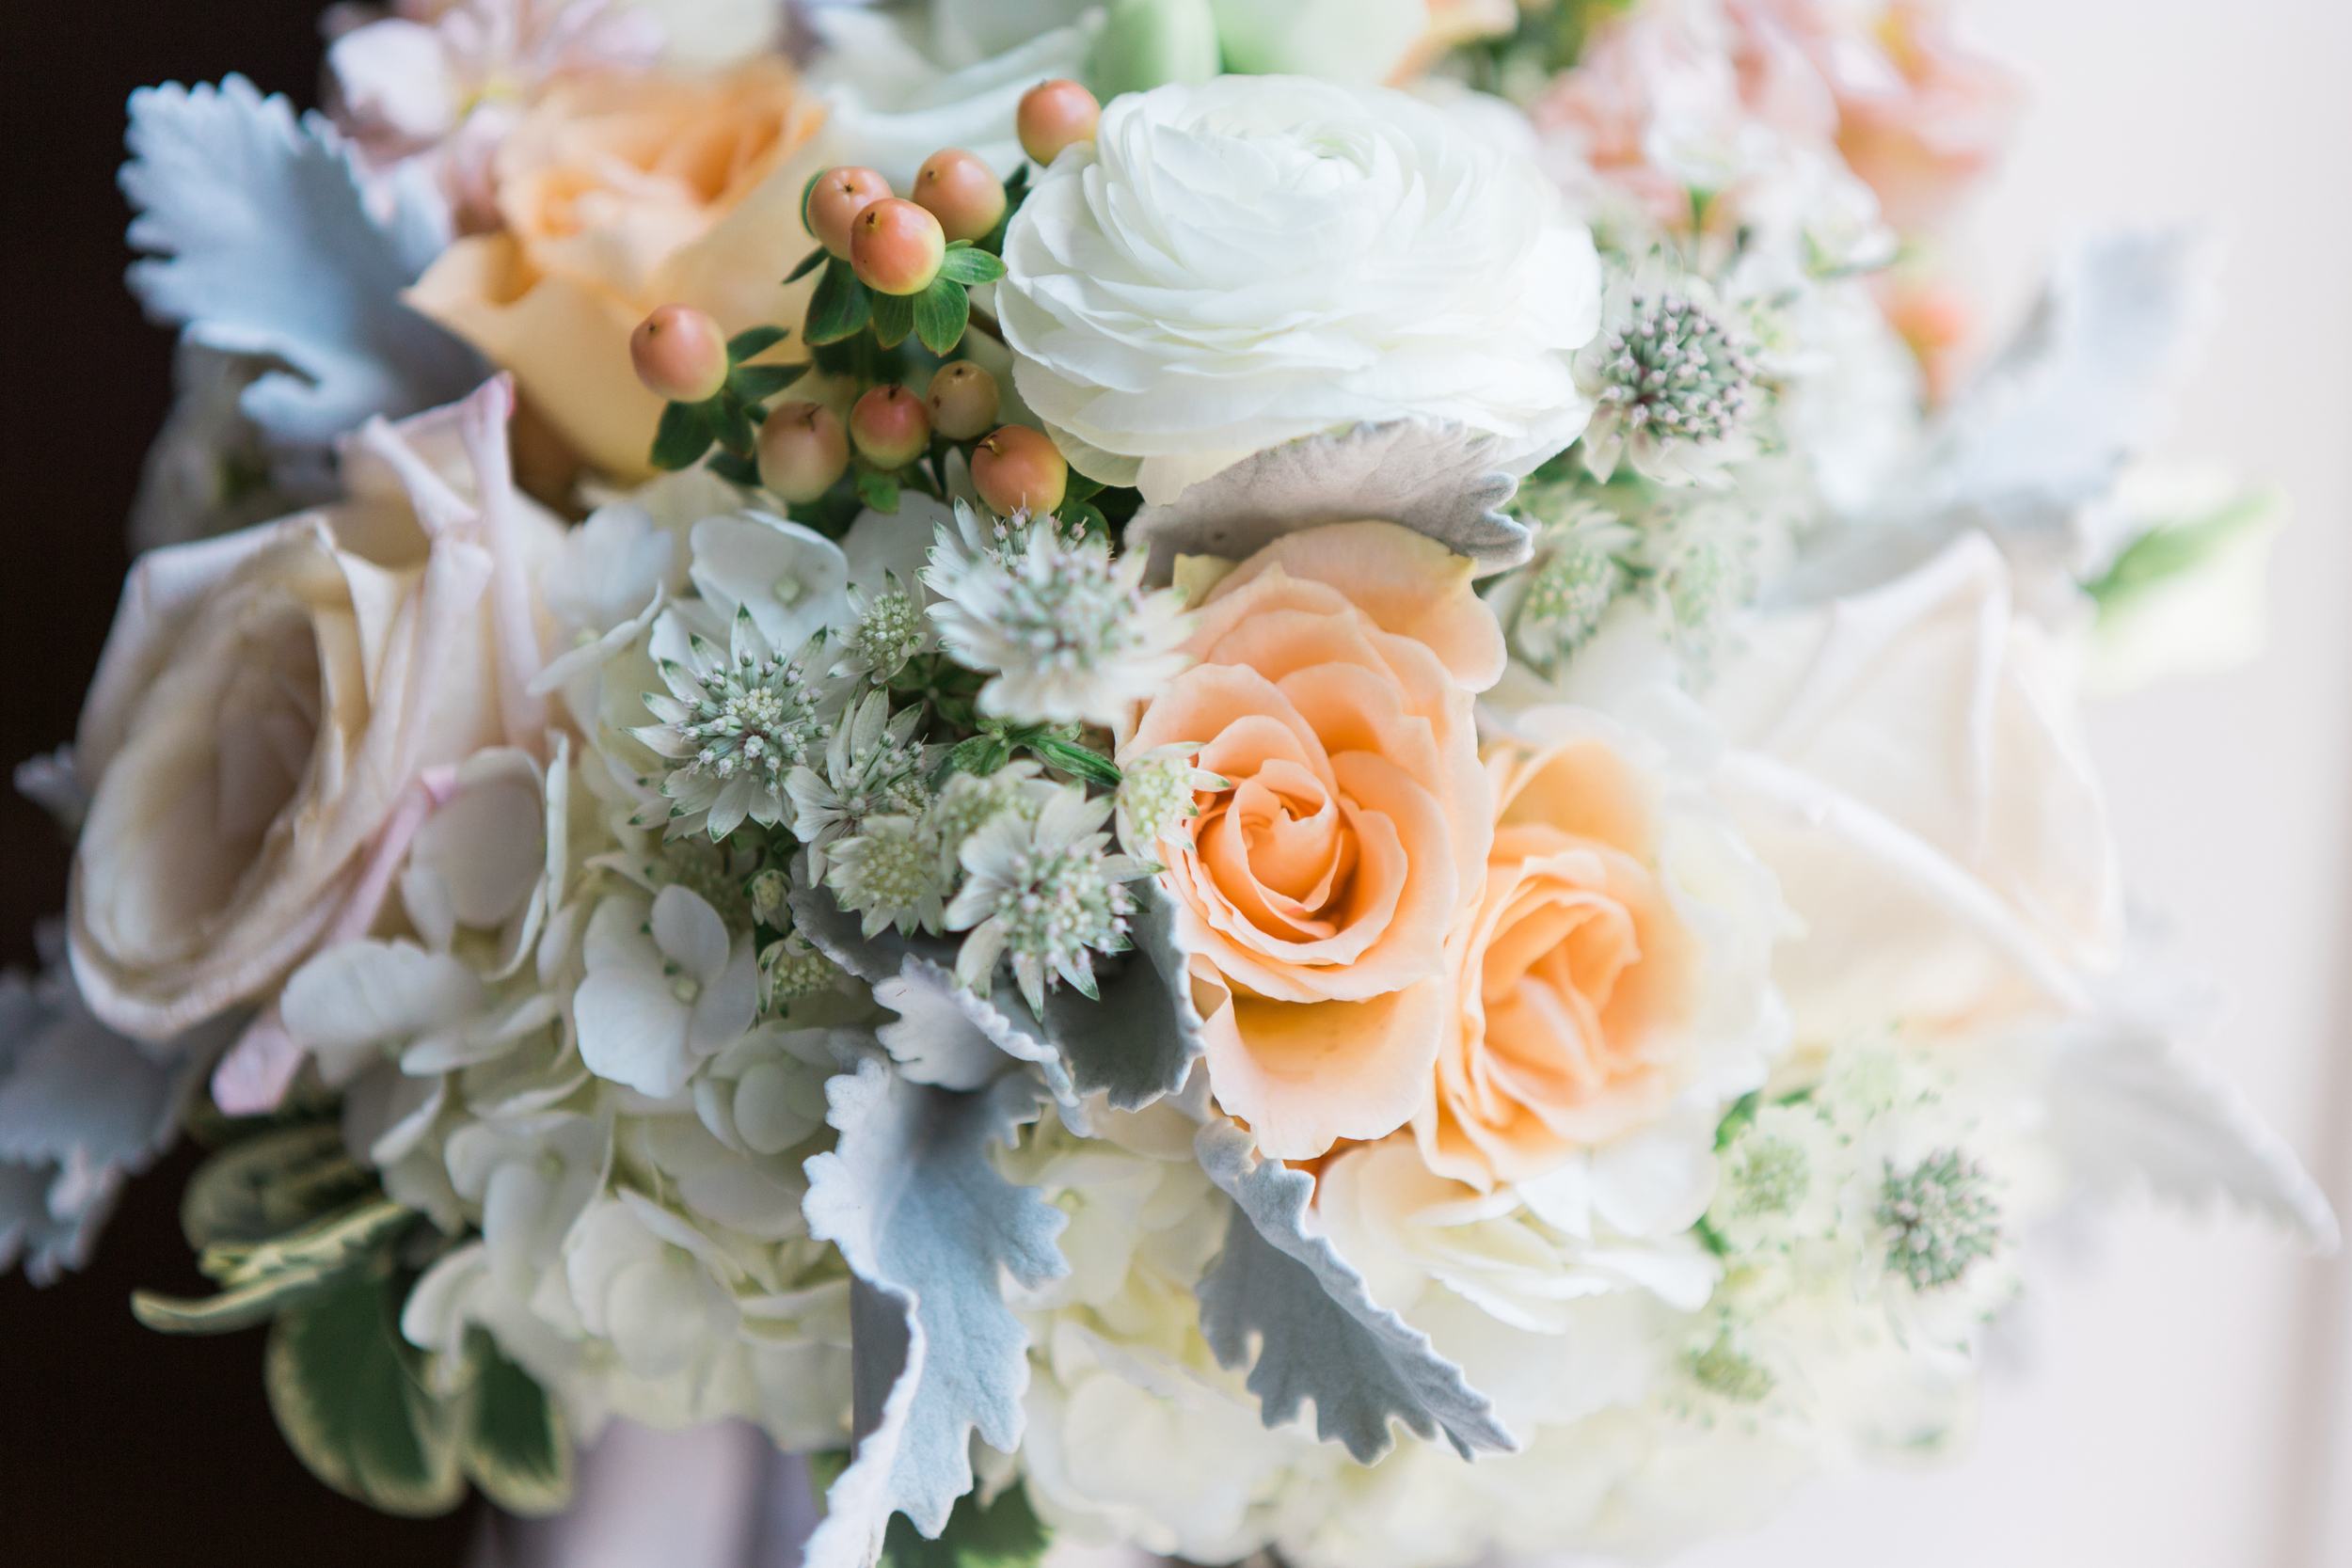 Brewbaker-Wedding-Montgomery-Alabama-Nick-Drollette-102.jpg